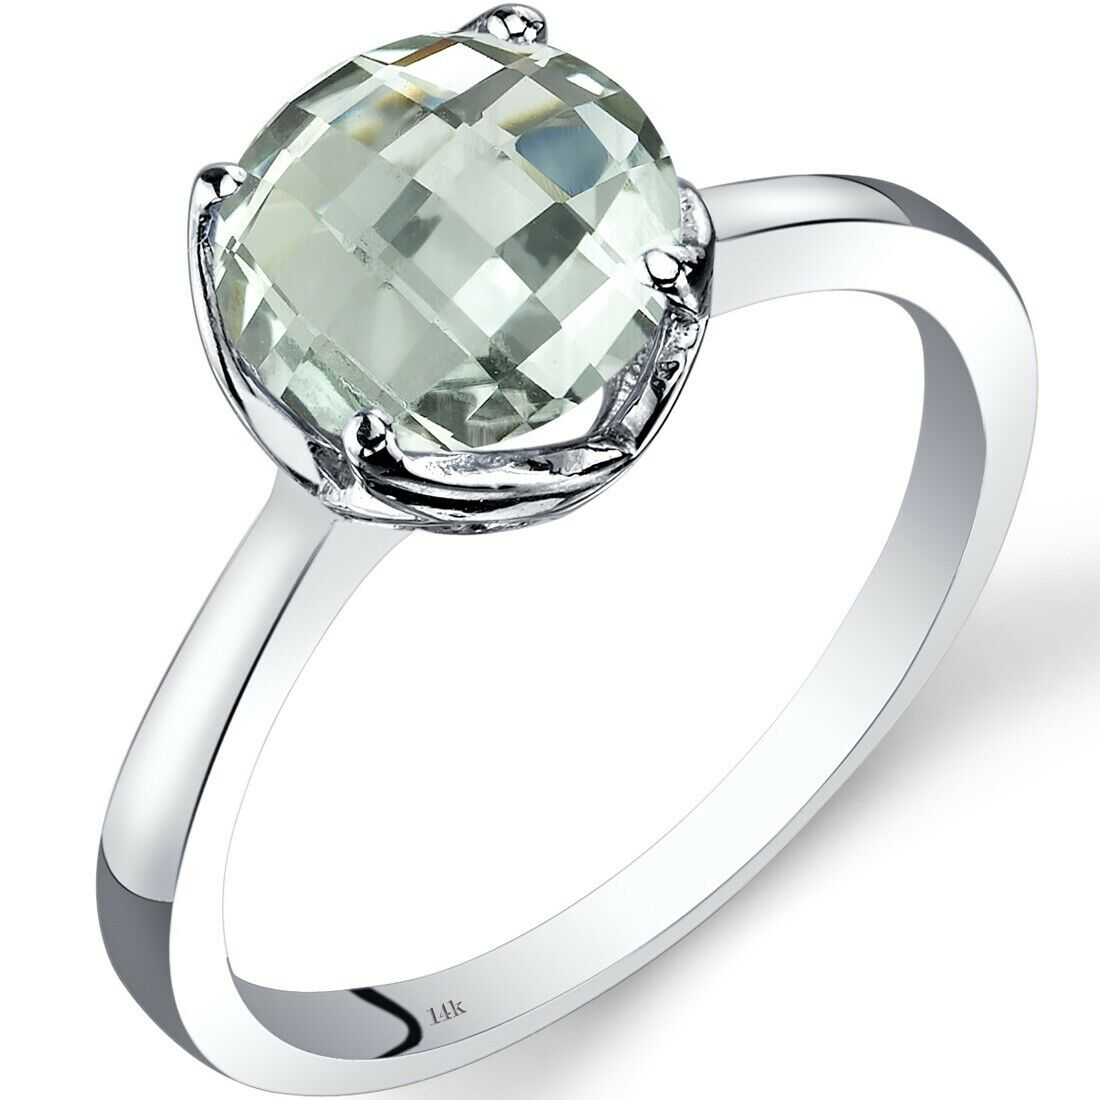 14K White Gold Green Amethyst Diamond Ring 1.75 Carat Round Cut Size 7